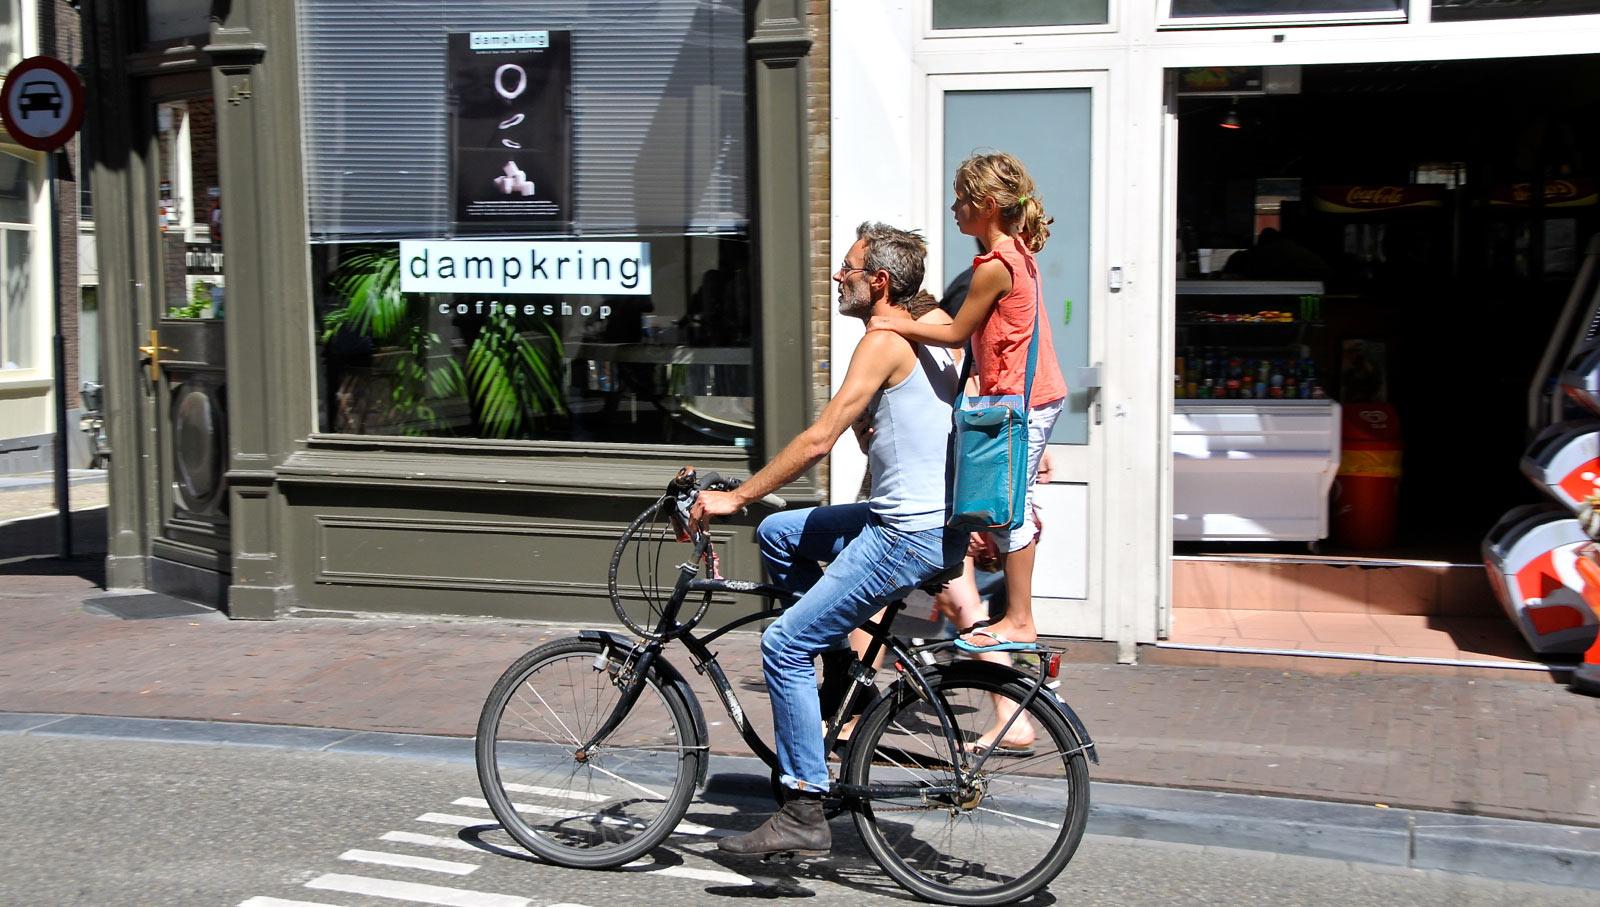 Amsterdam, Dampkring Coffeeshop